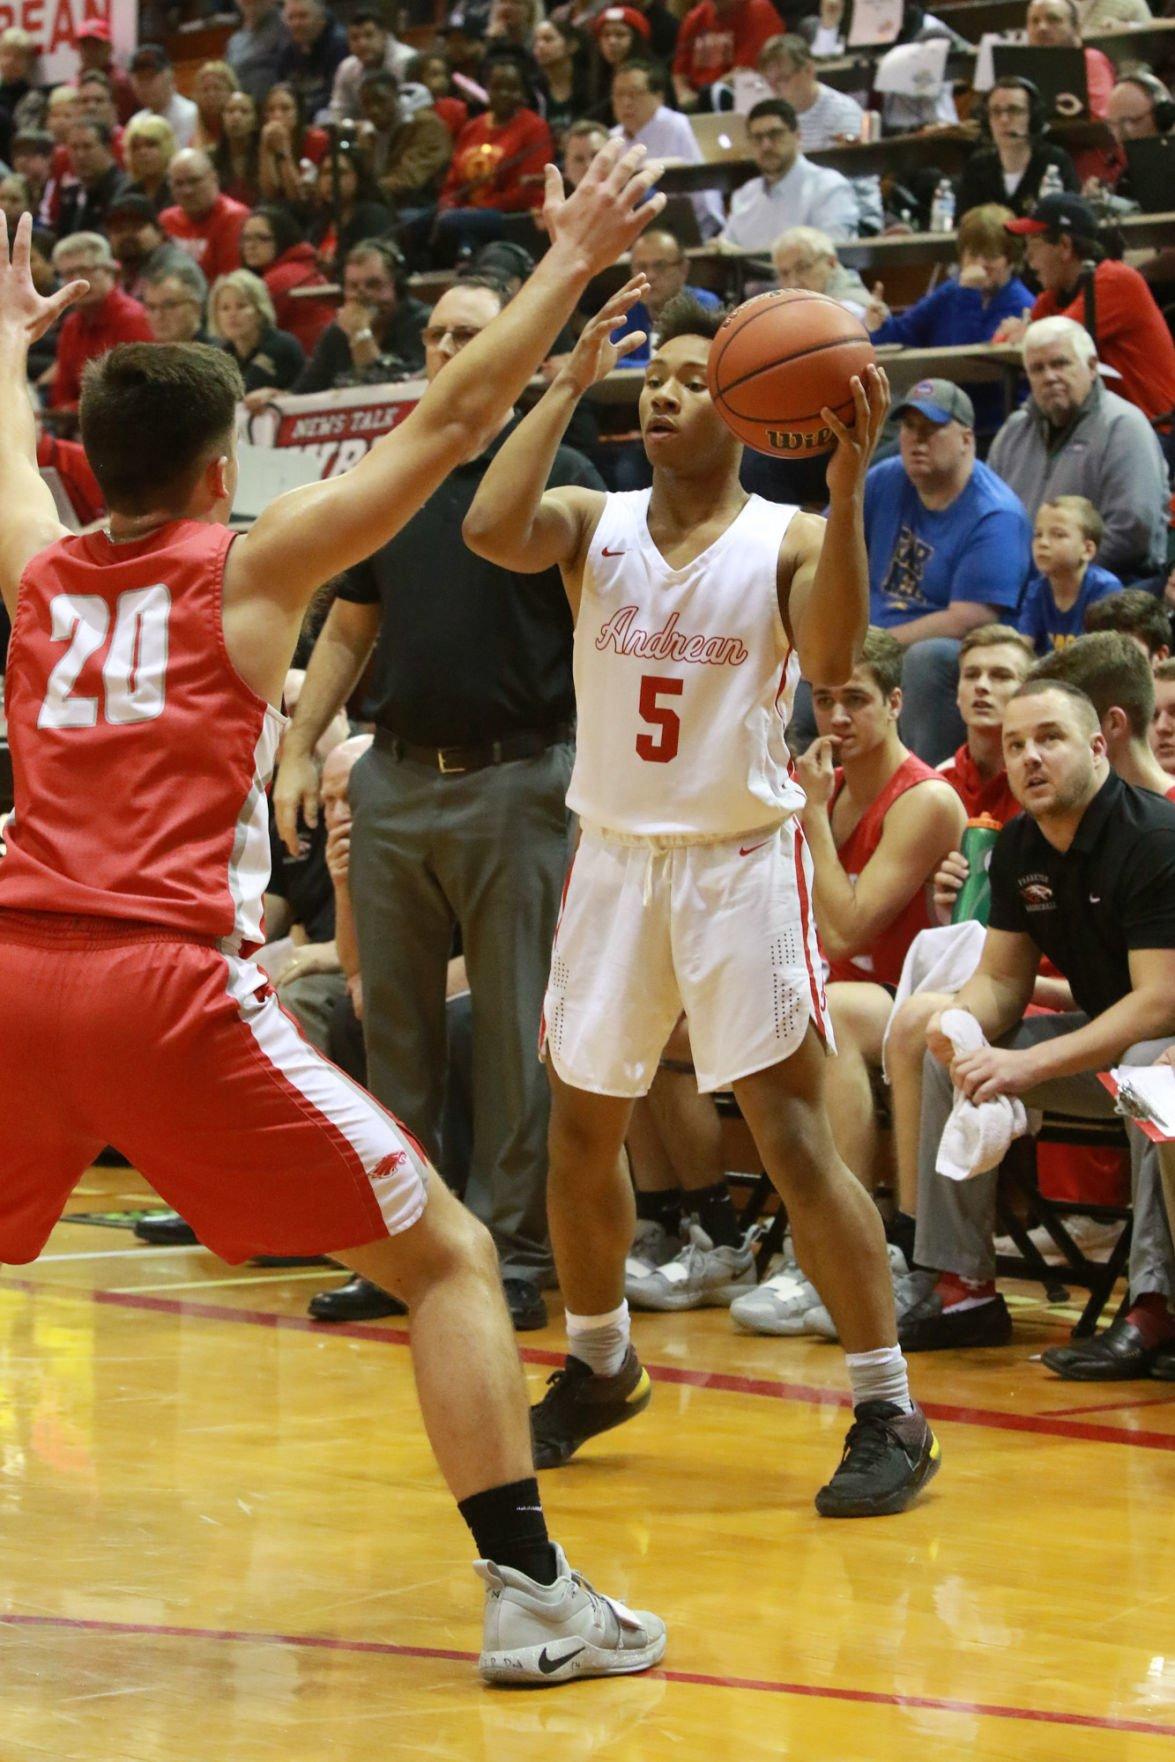 Gallery: Class 2A boys basketball semistate: Andrean vs Frankton (copy)